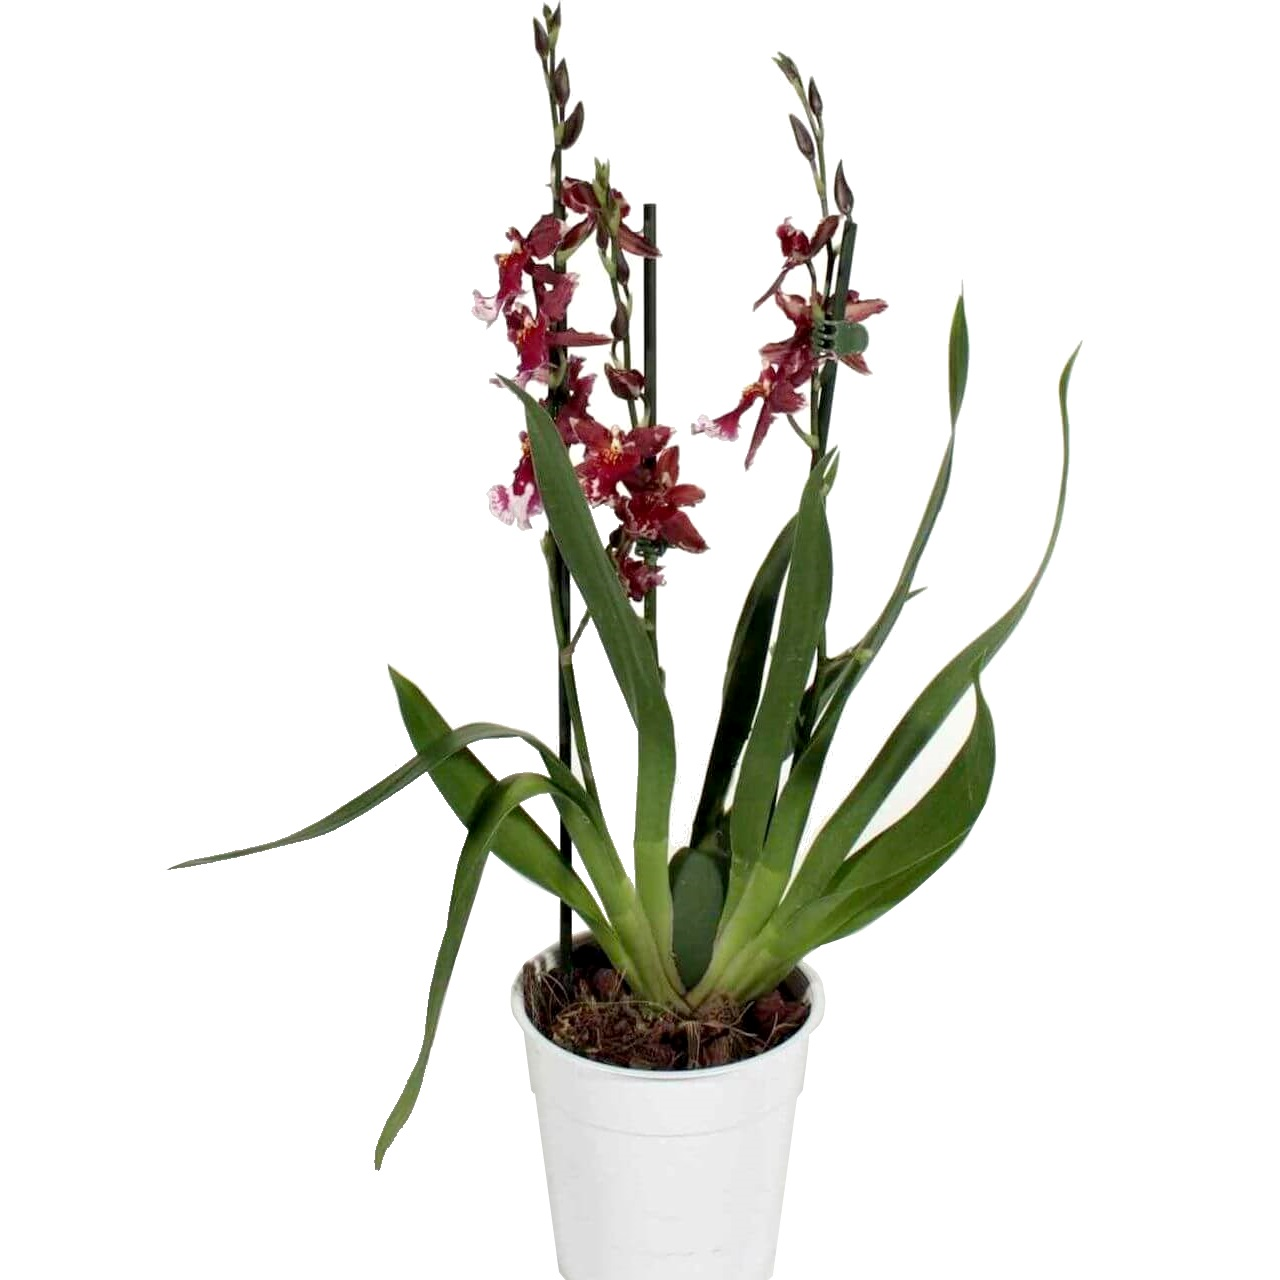 Орхидея Камбрия Буррагеара Лацио